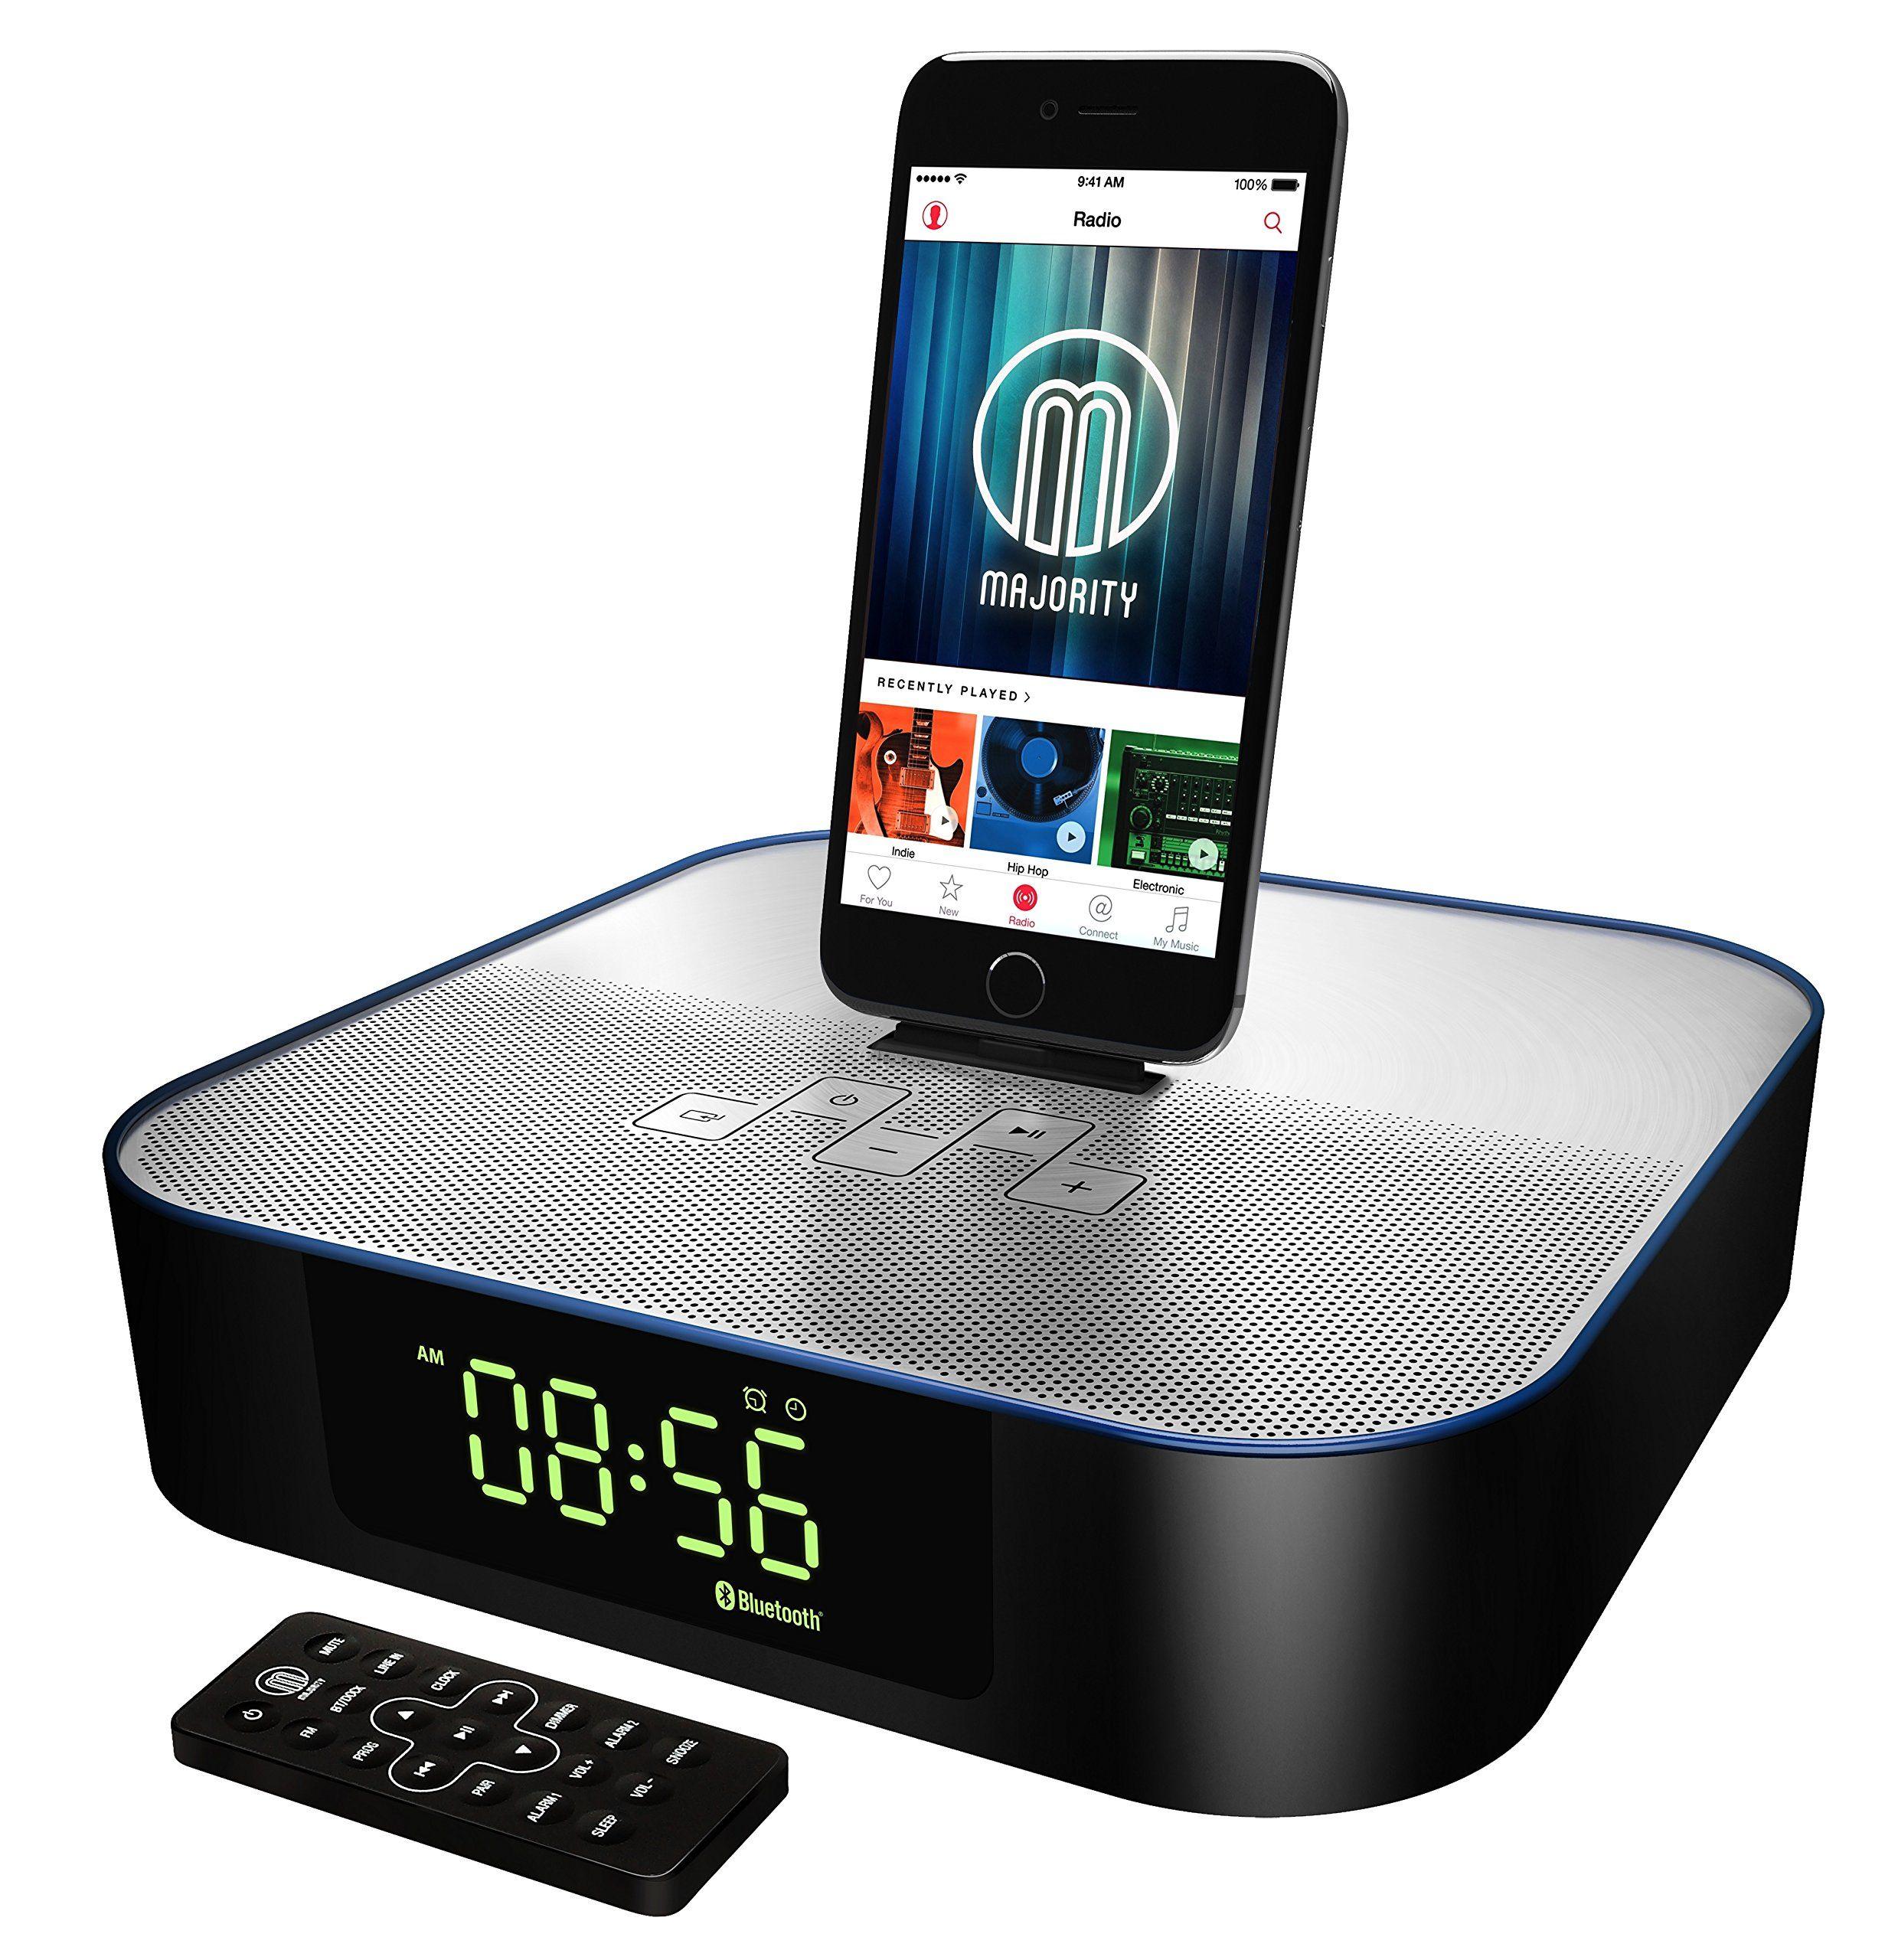 Titan Speaker Docking Station Bluetooth Alarm Clock Fm Radio Lightning Dock For Iphone 5 5s 5c 6 6 6s Ipad Air Mini Ipod Iphone Iphone 5 Ipod